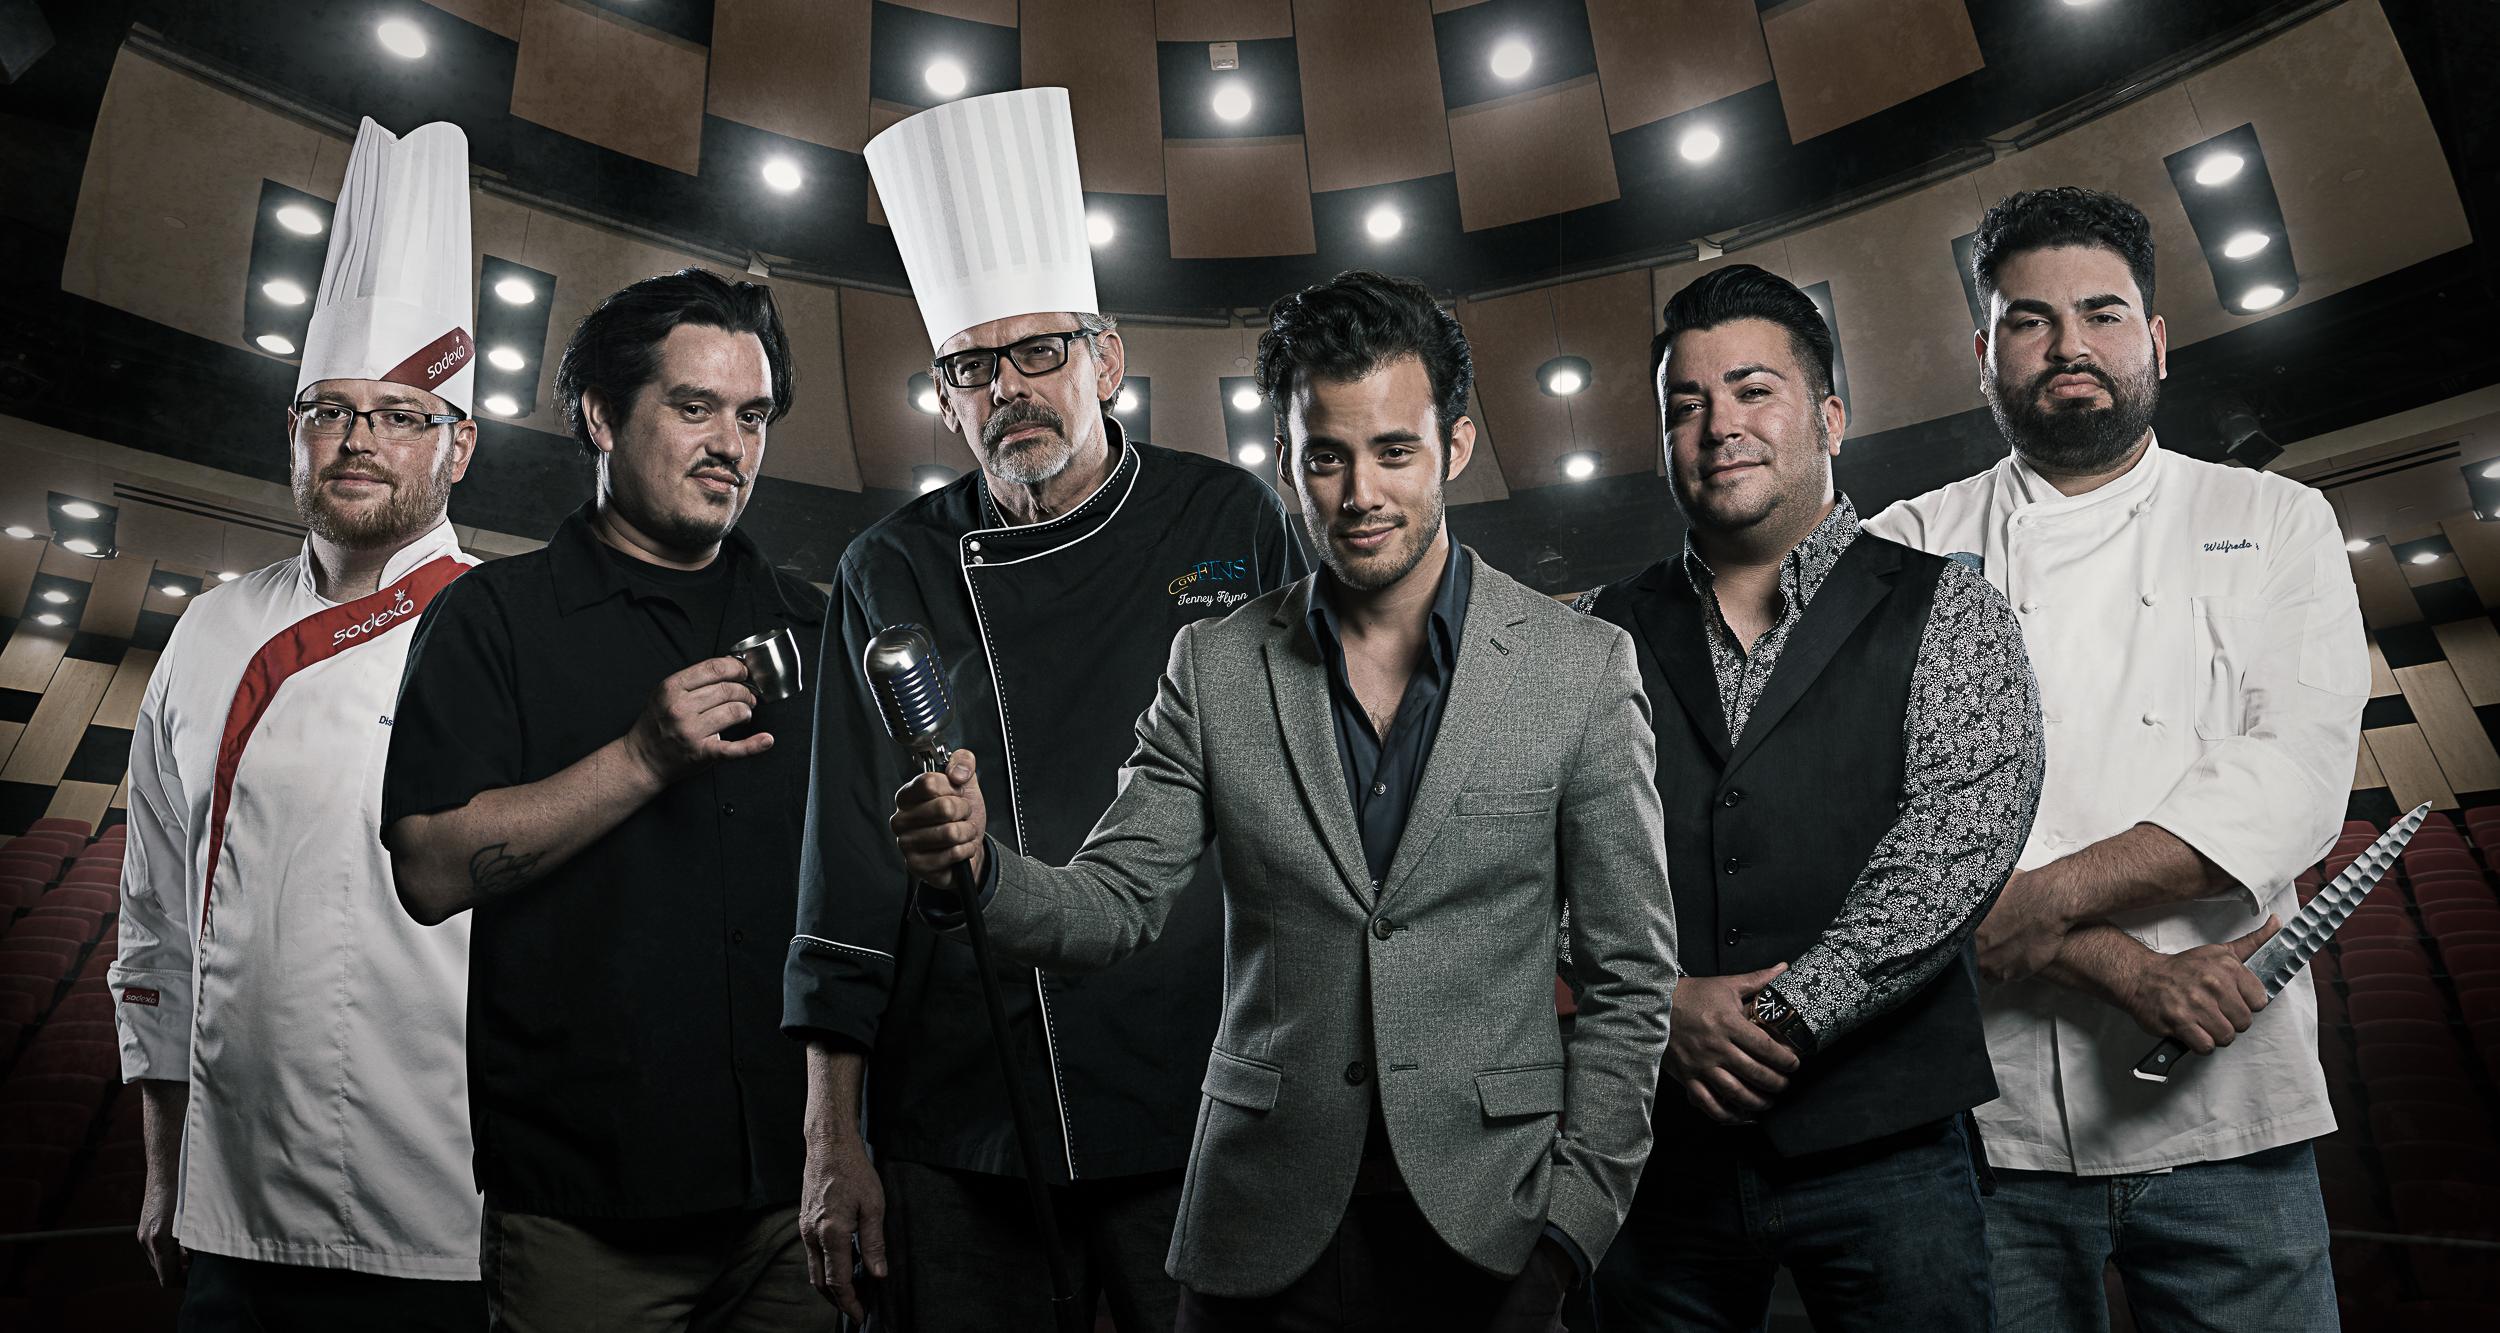 (From Left to Right) Chef Travis Johnson, Chef Octavio Ycaza, Chef Tenney Flynn, Creative Director David Castillo, Chef Phillip Lopez, & Chef Will Avelar.  Photo Credit: Matthew & Becky Noel